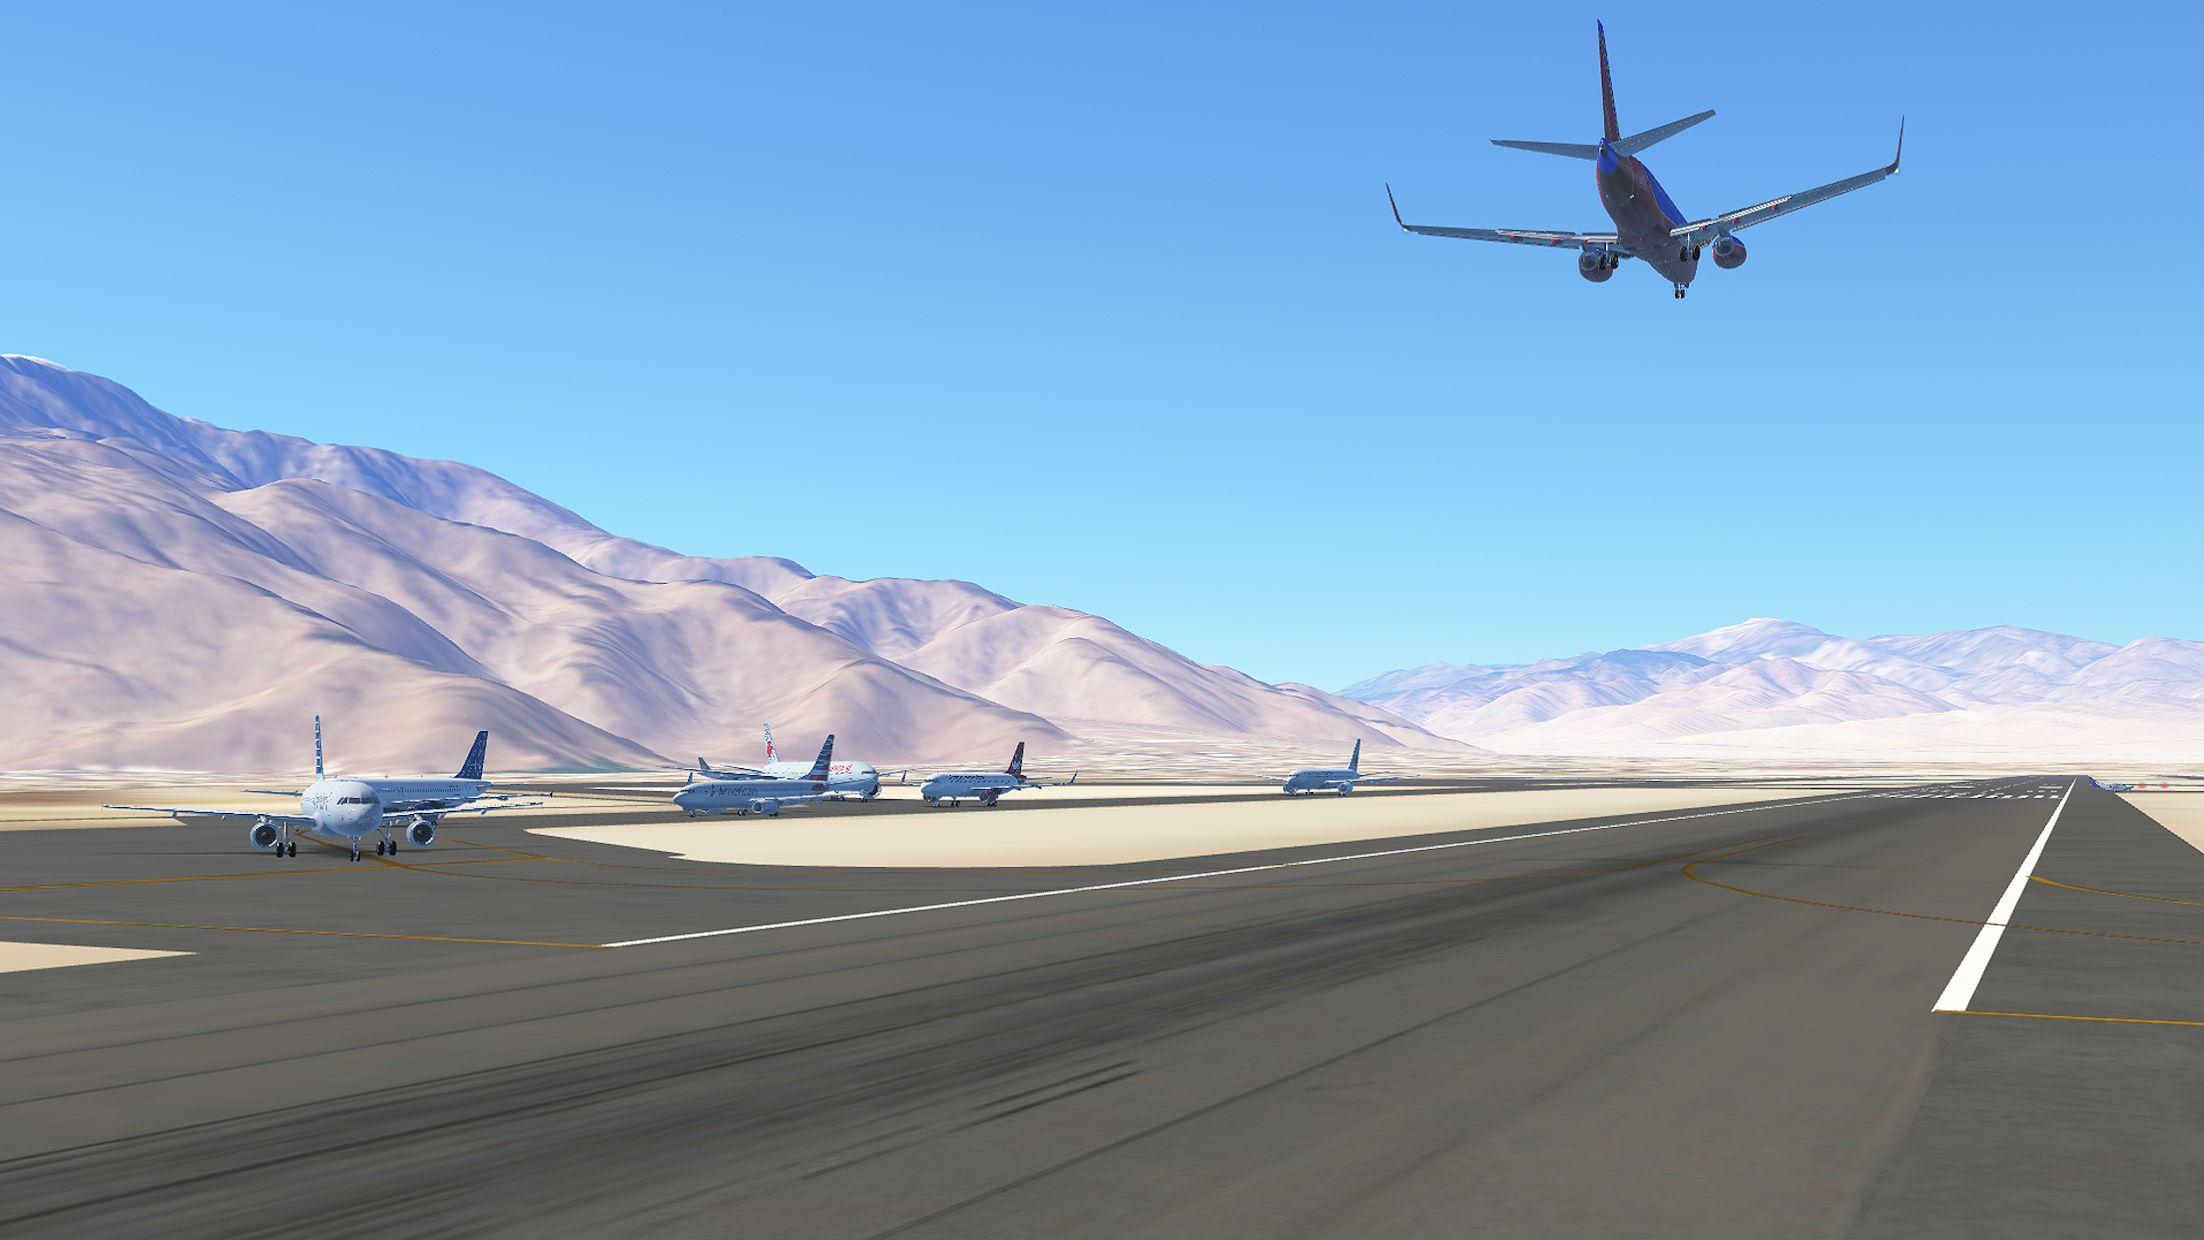 Infinite Flight-飞行模拟器 游戏截图5